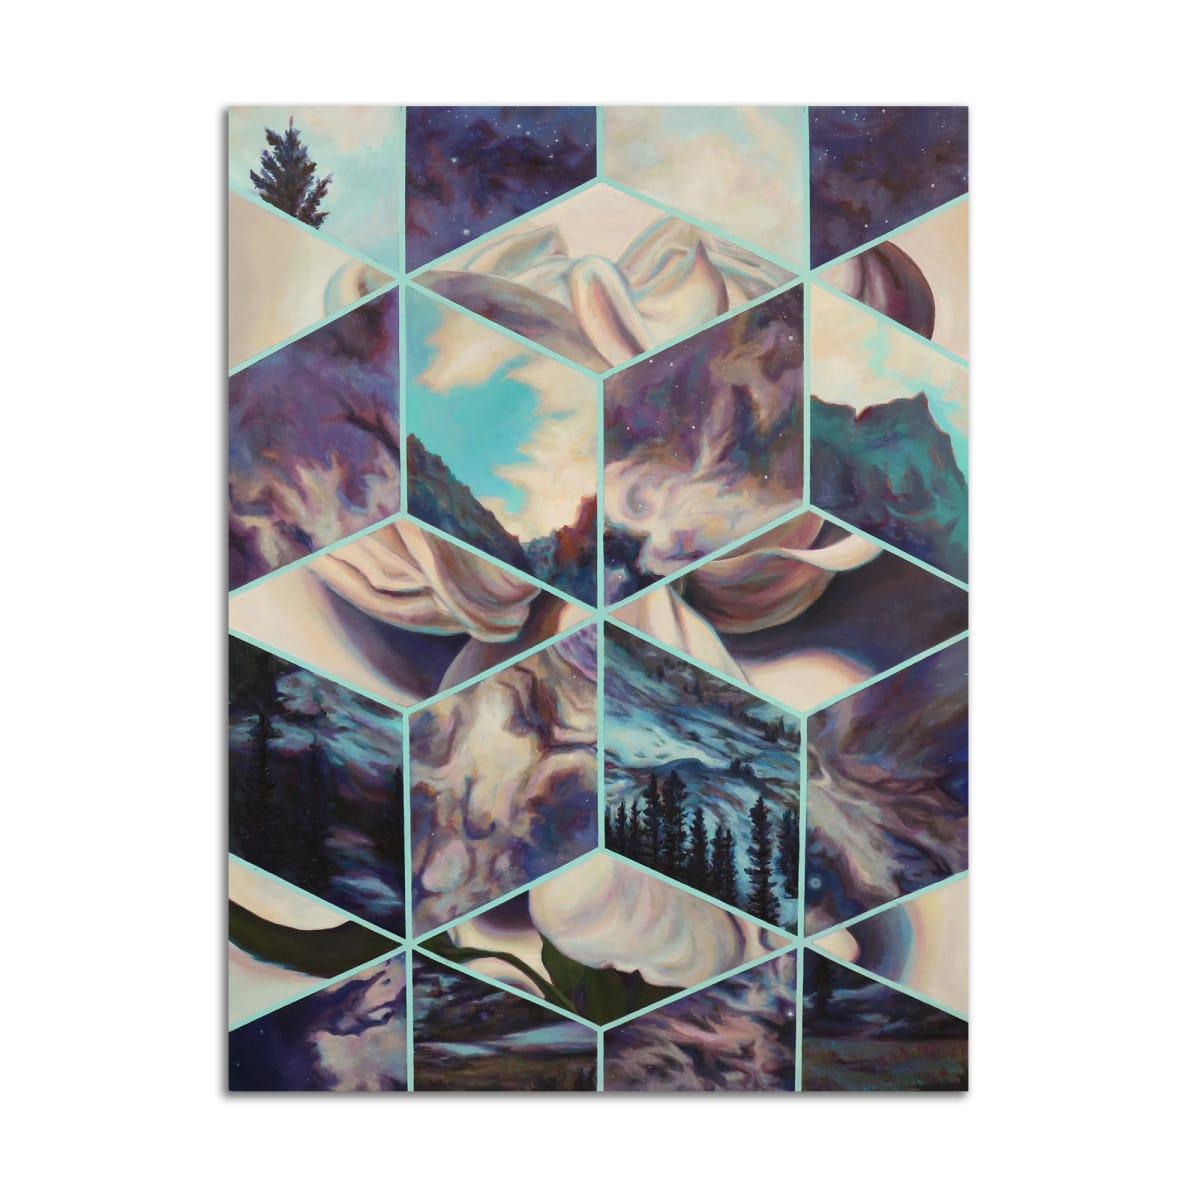 Fragmentation by Christie Snelson